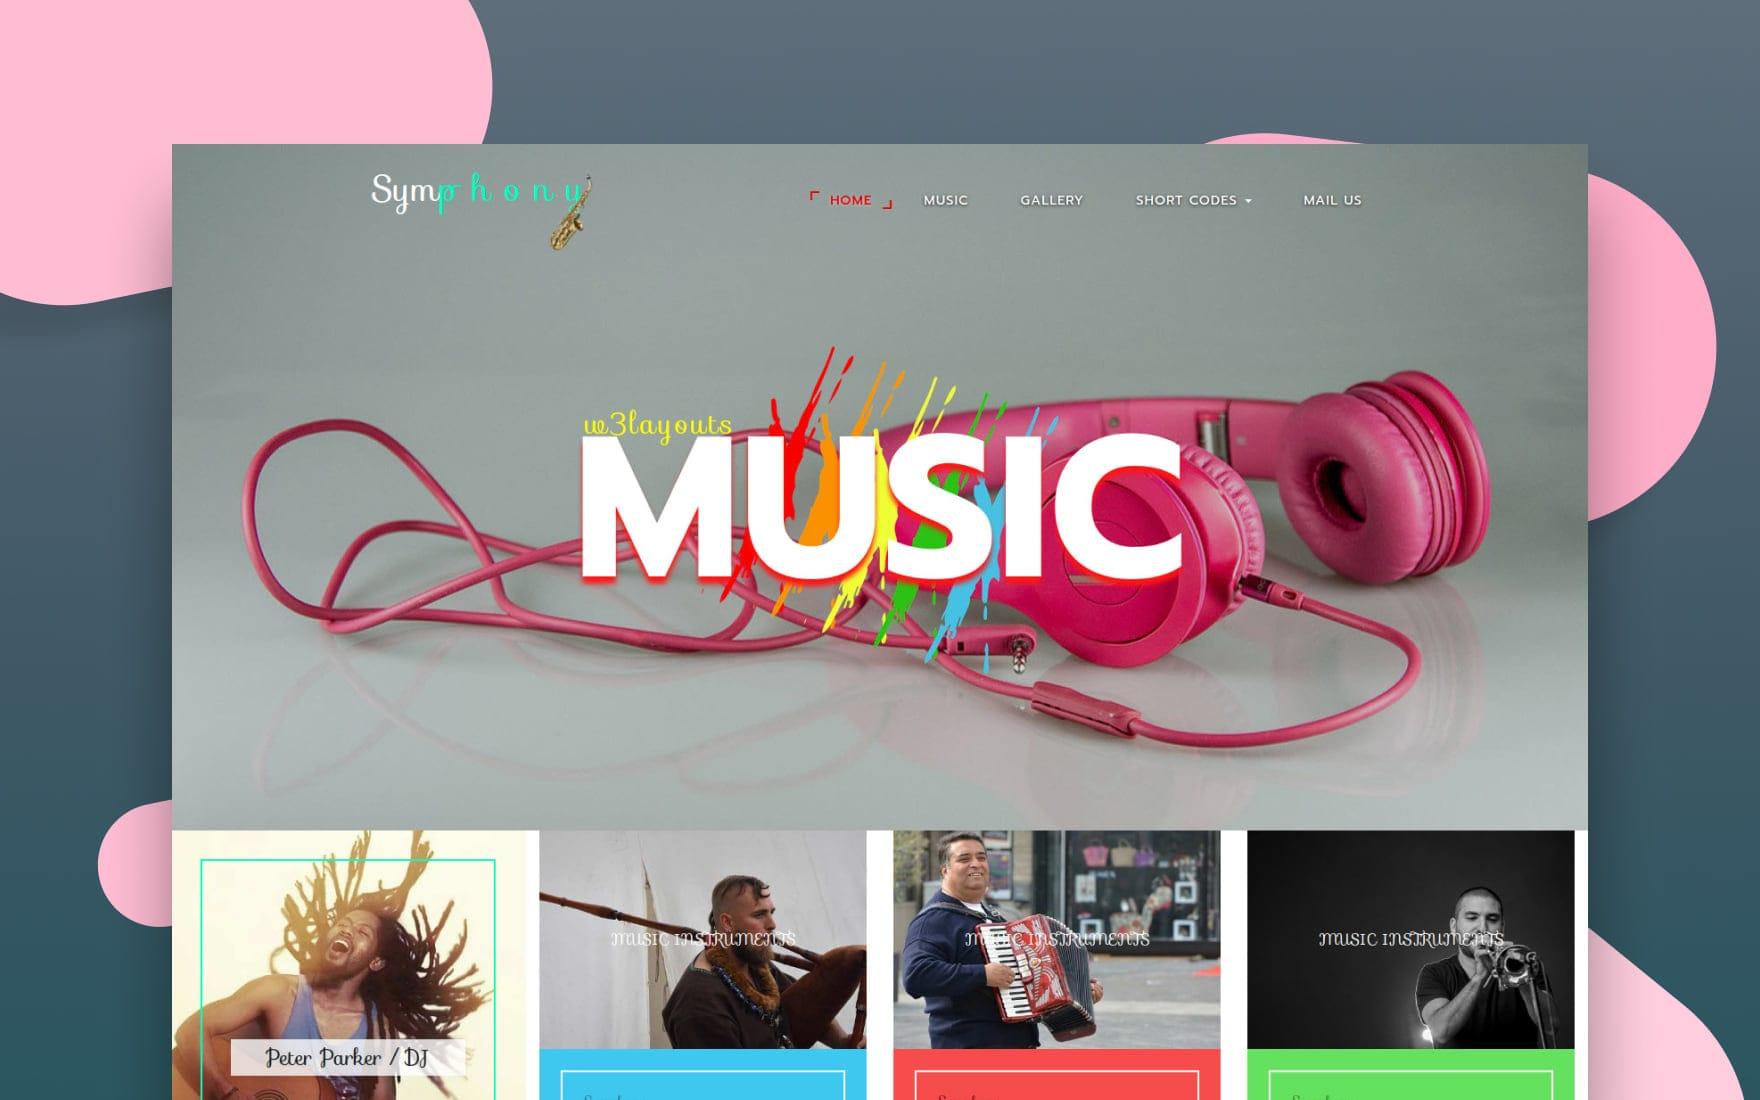 Symphony an Entertainment Flat Bootstrap Responsive Web Template